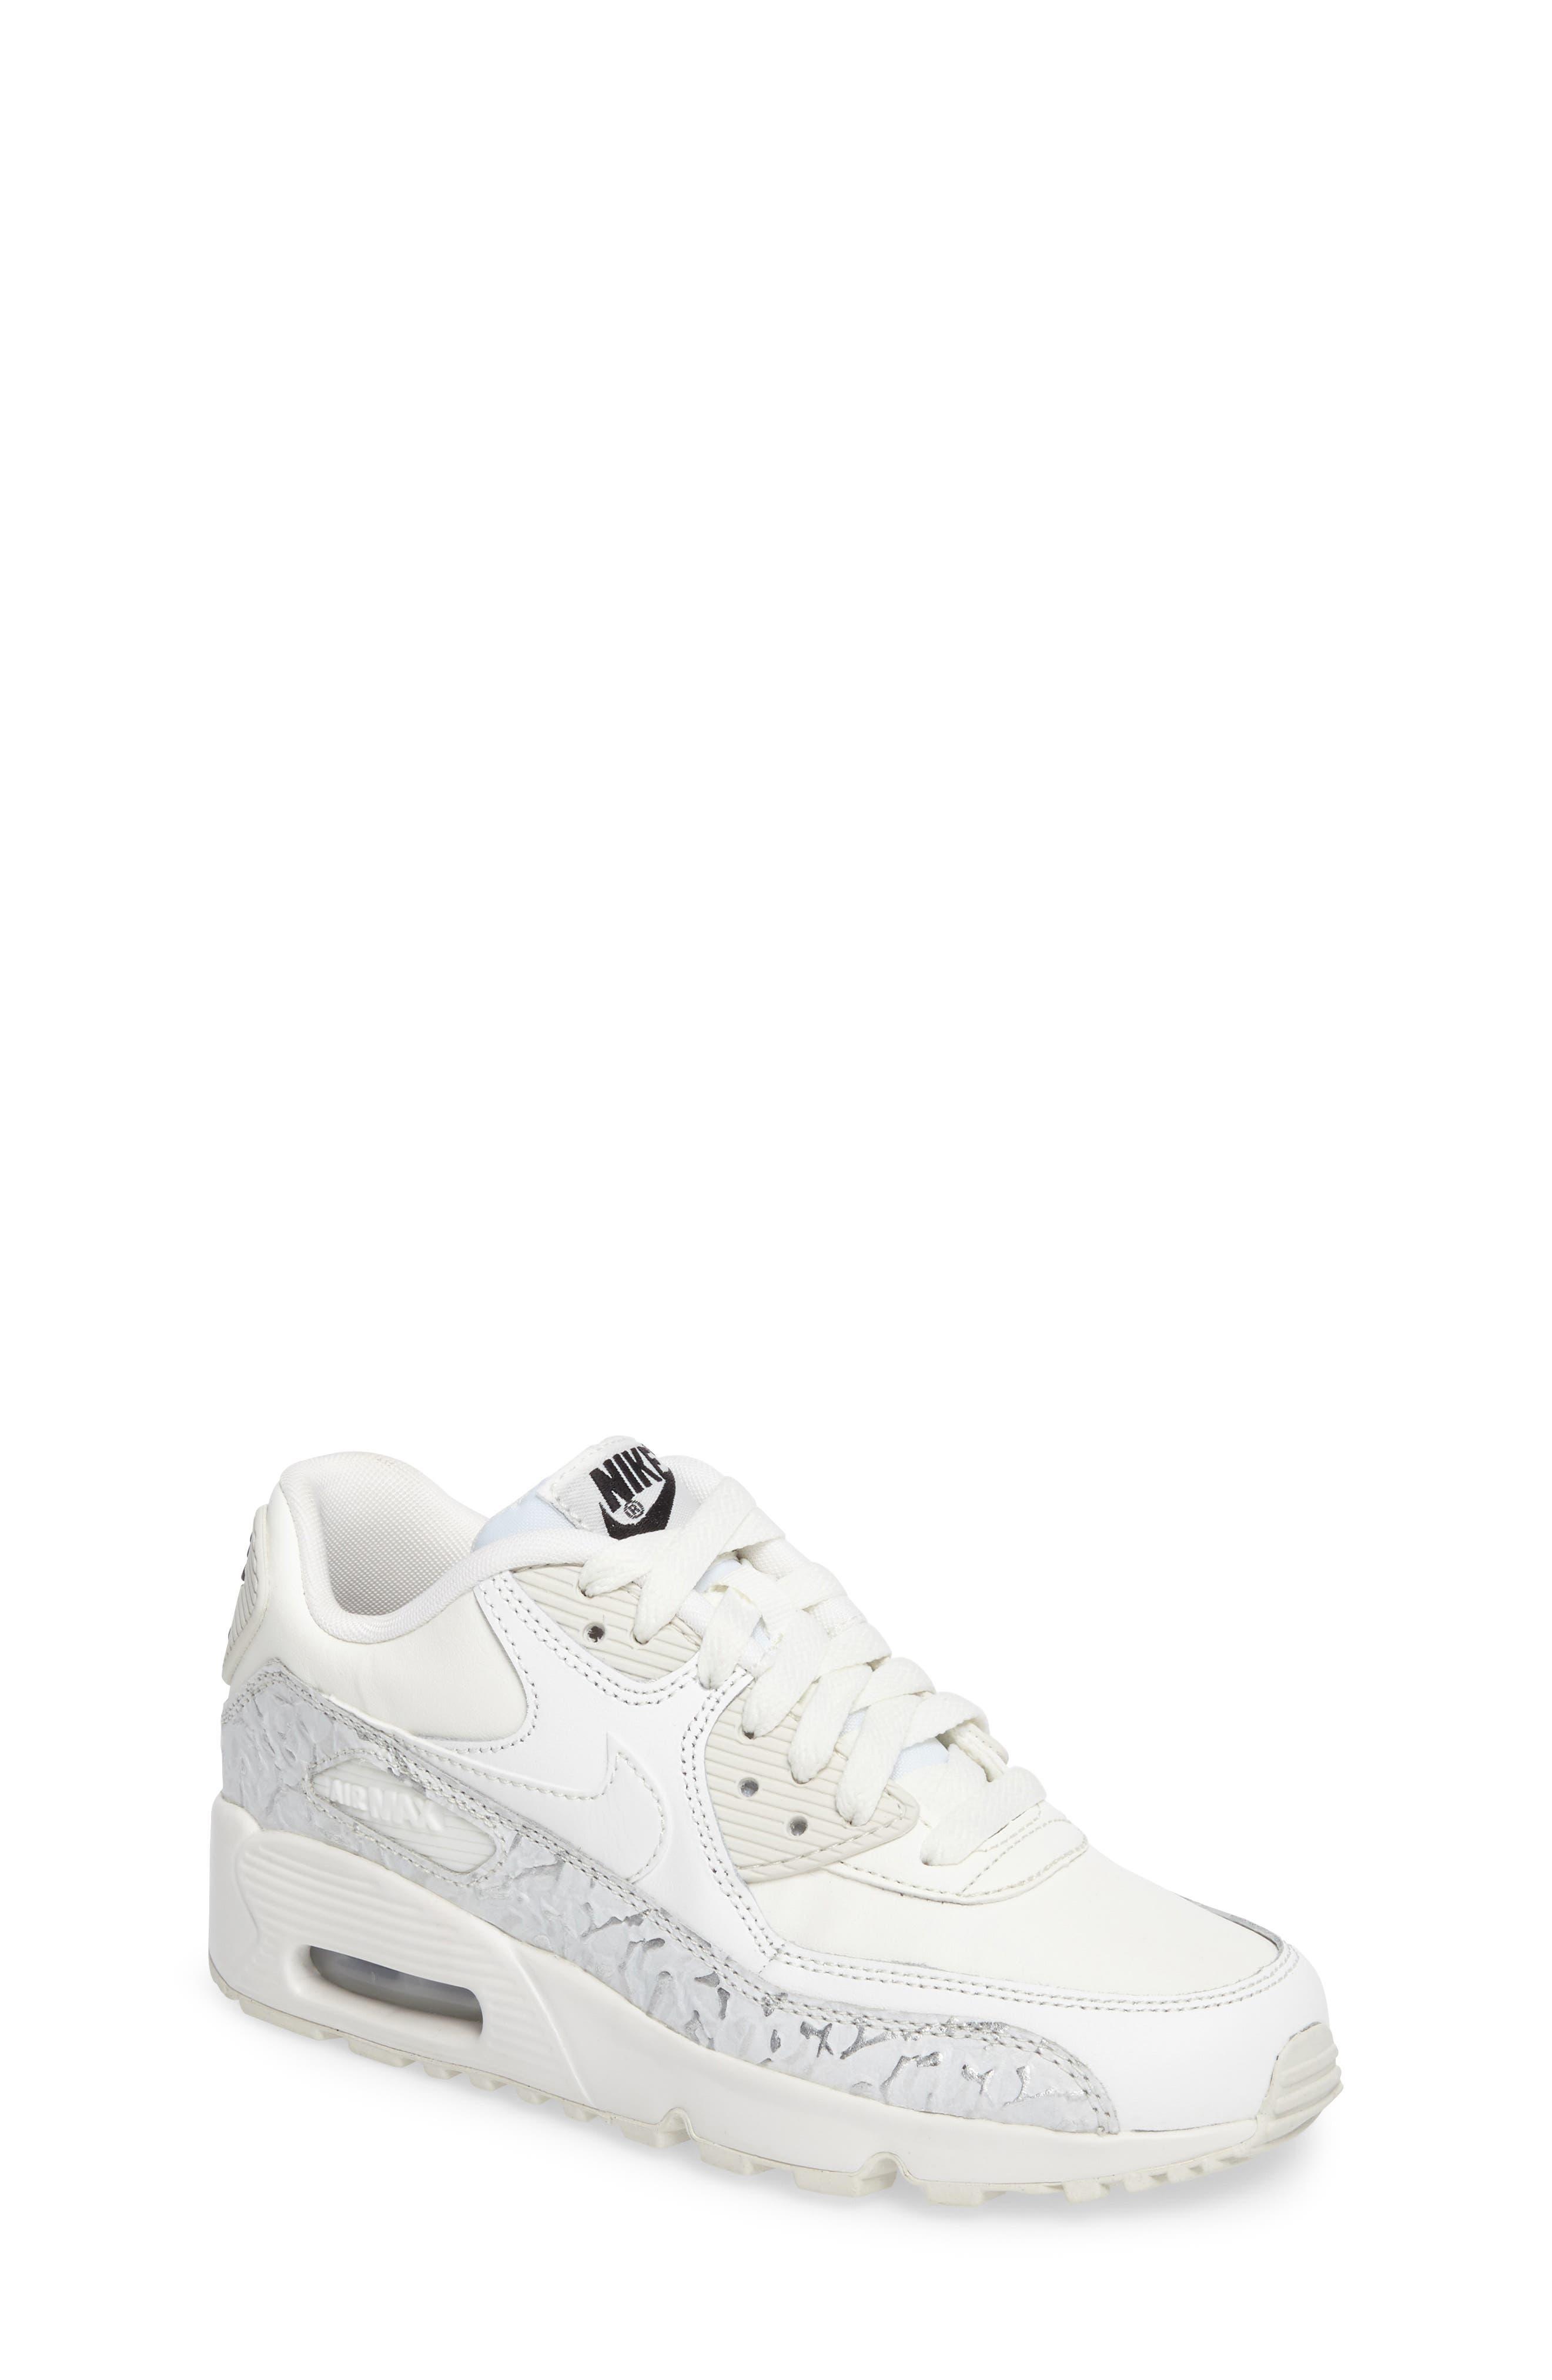 Alternate Image 1 Selected - Nike Air Max 90 Leather Sneaker (Big Kid)